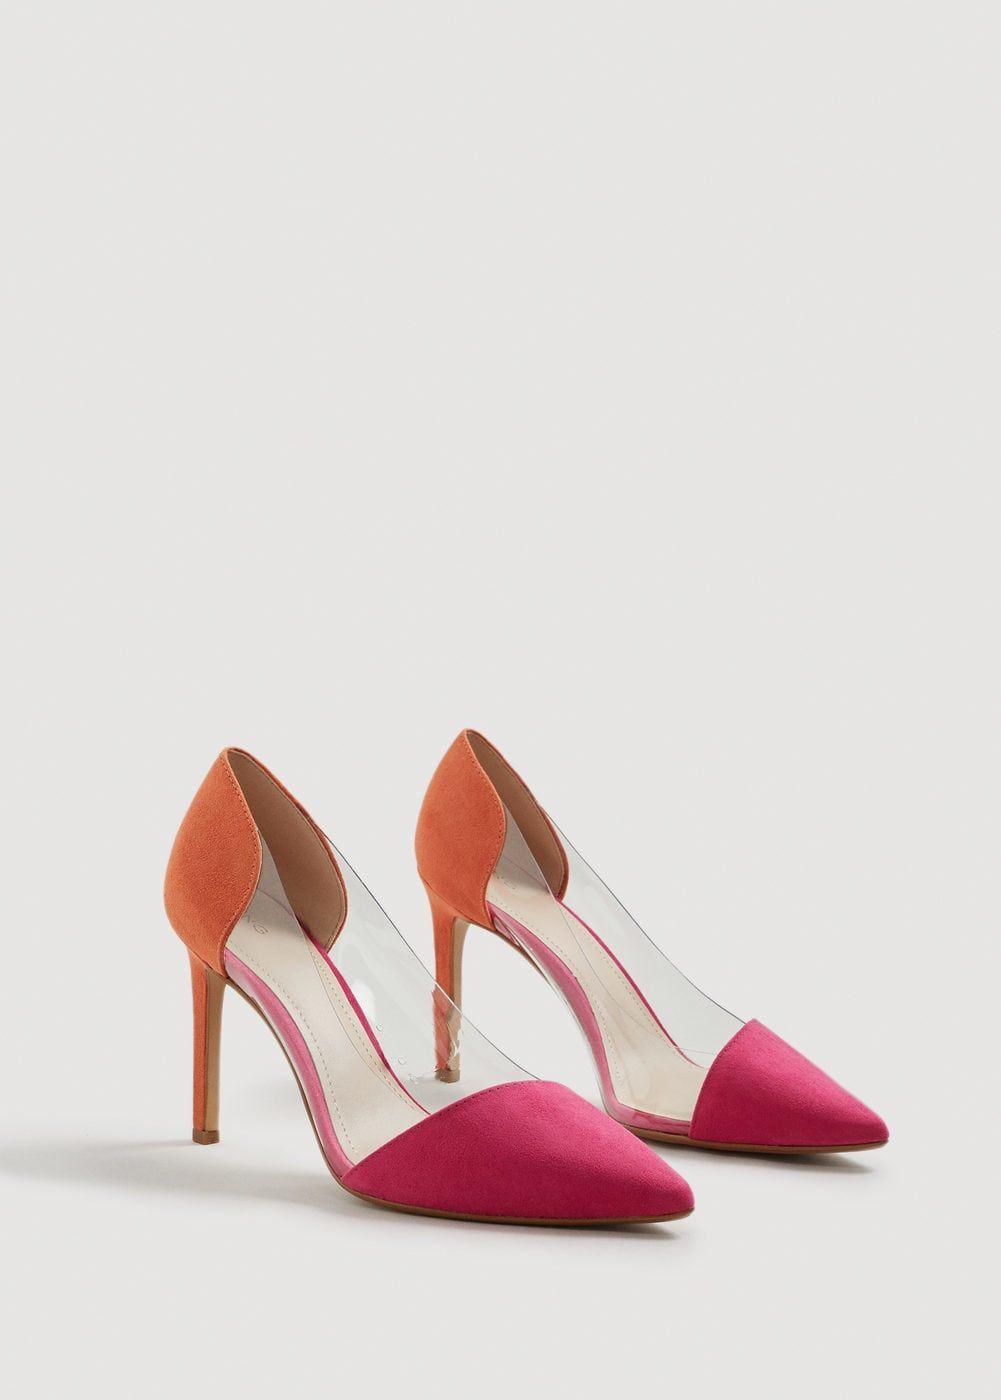 096f7711ad1 Salón paneles transparentes - Zapatos de Mujer